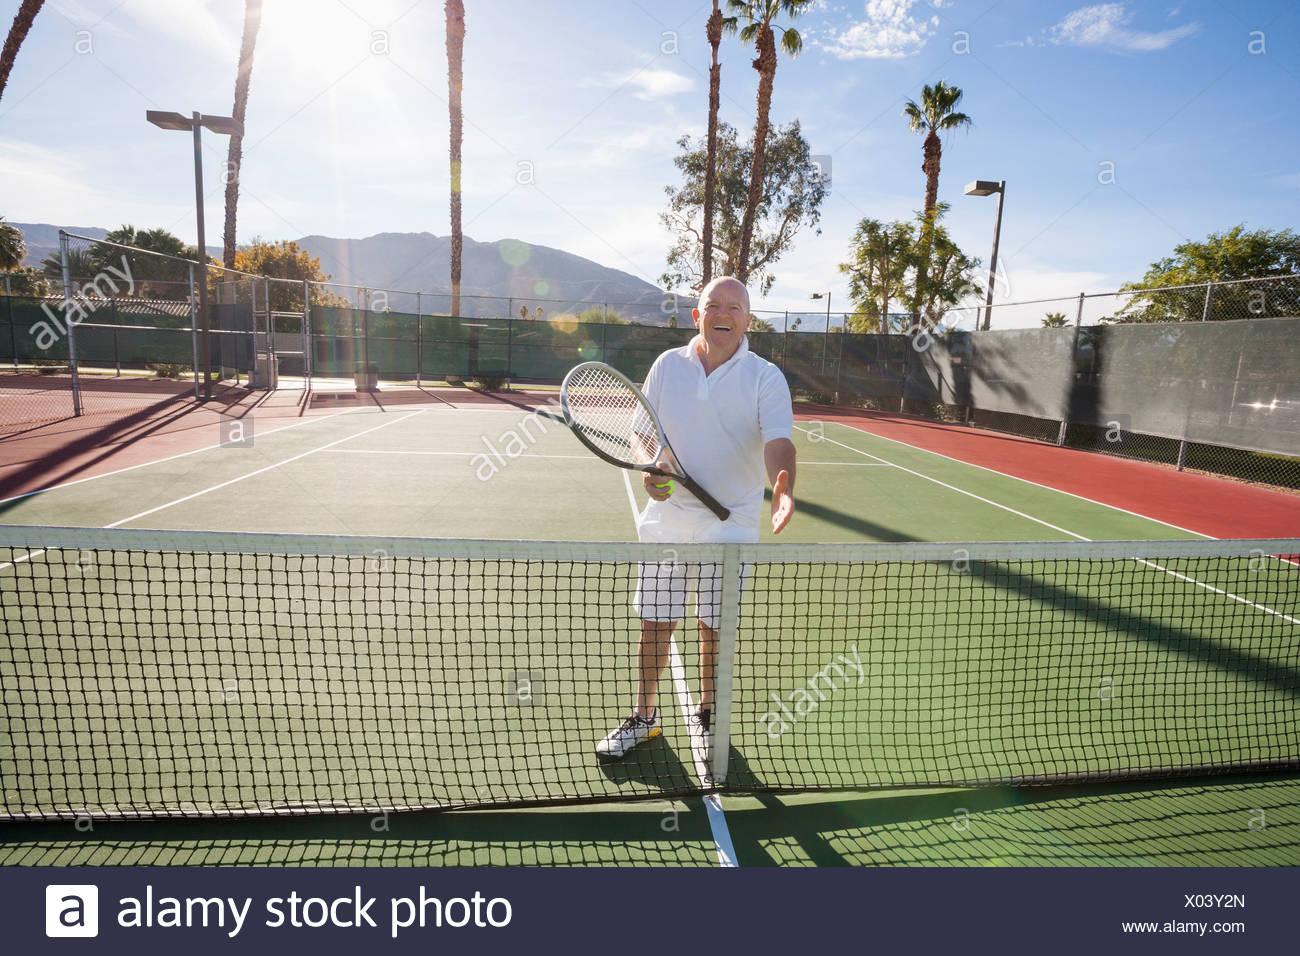 Portrait de senior tennis player offrant handshake on court Photo Stock